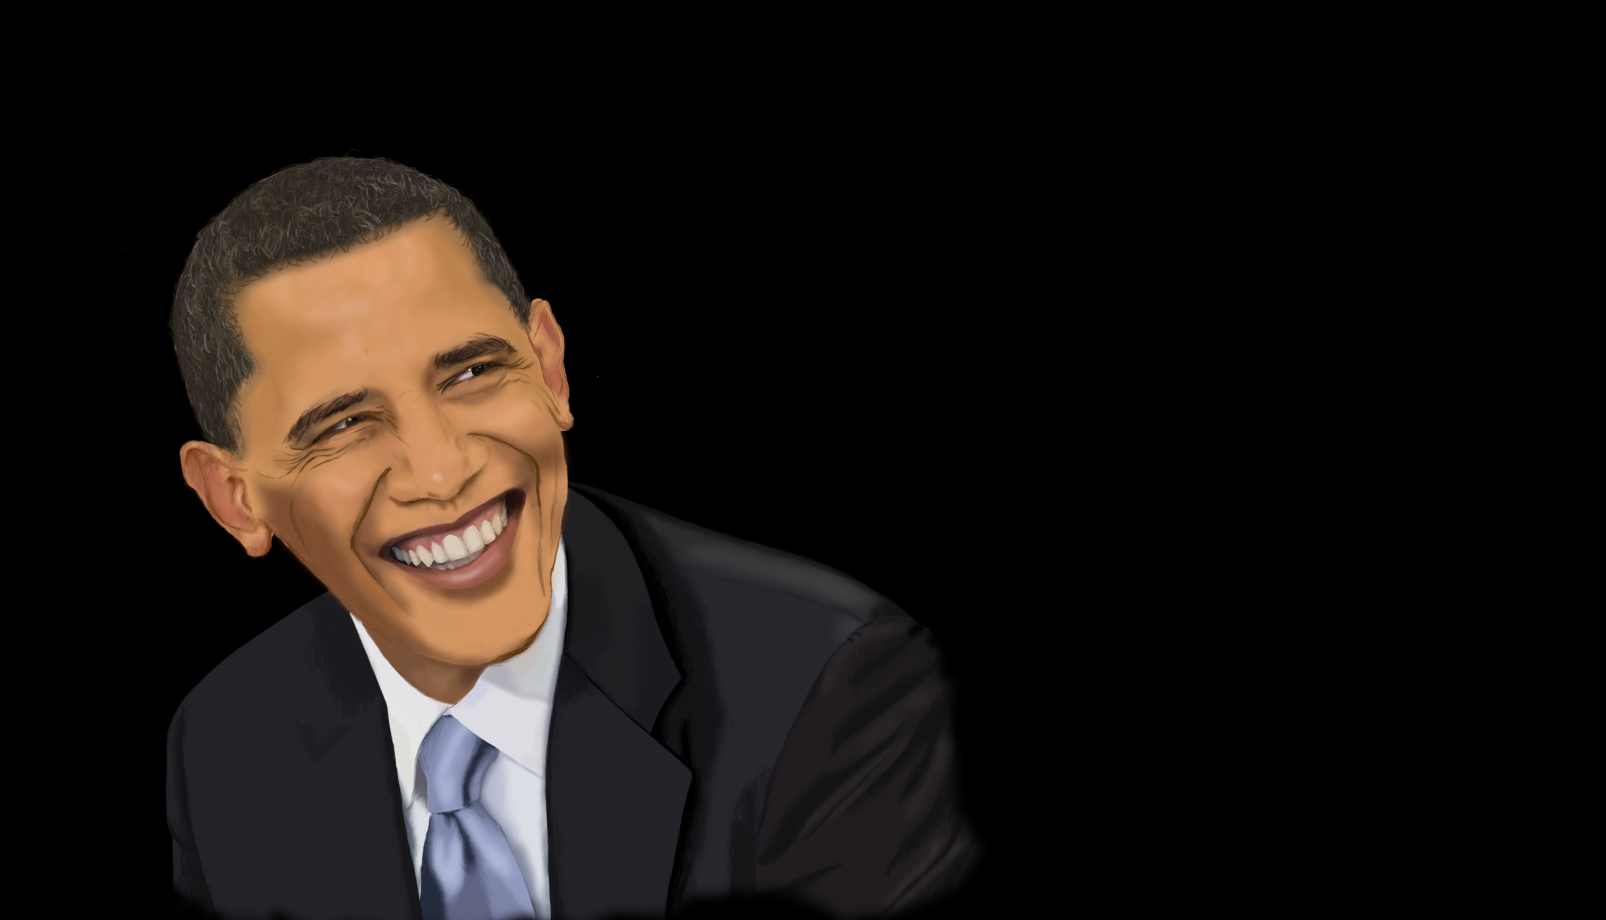 Obama Portrait (tablet + photoshop)